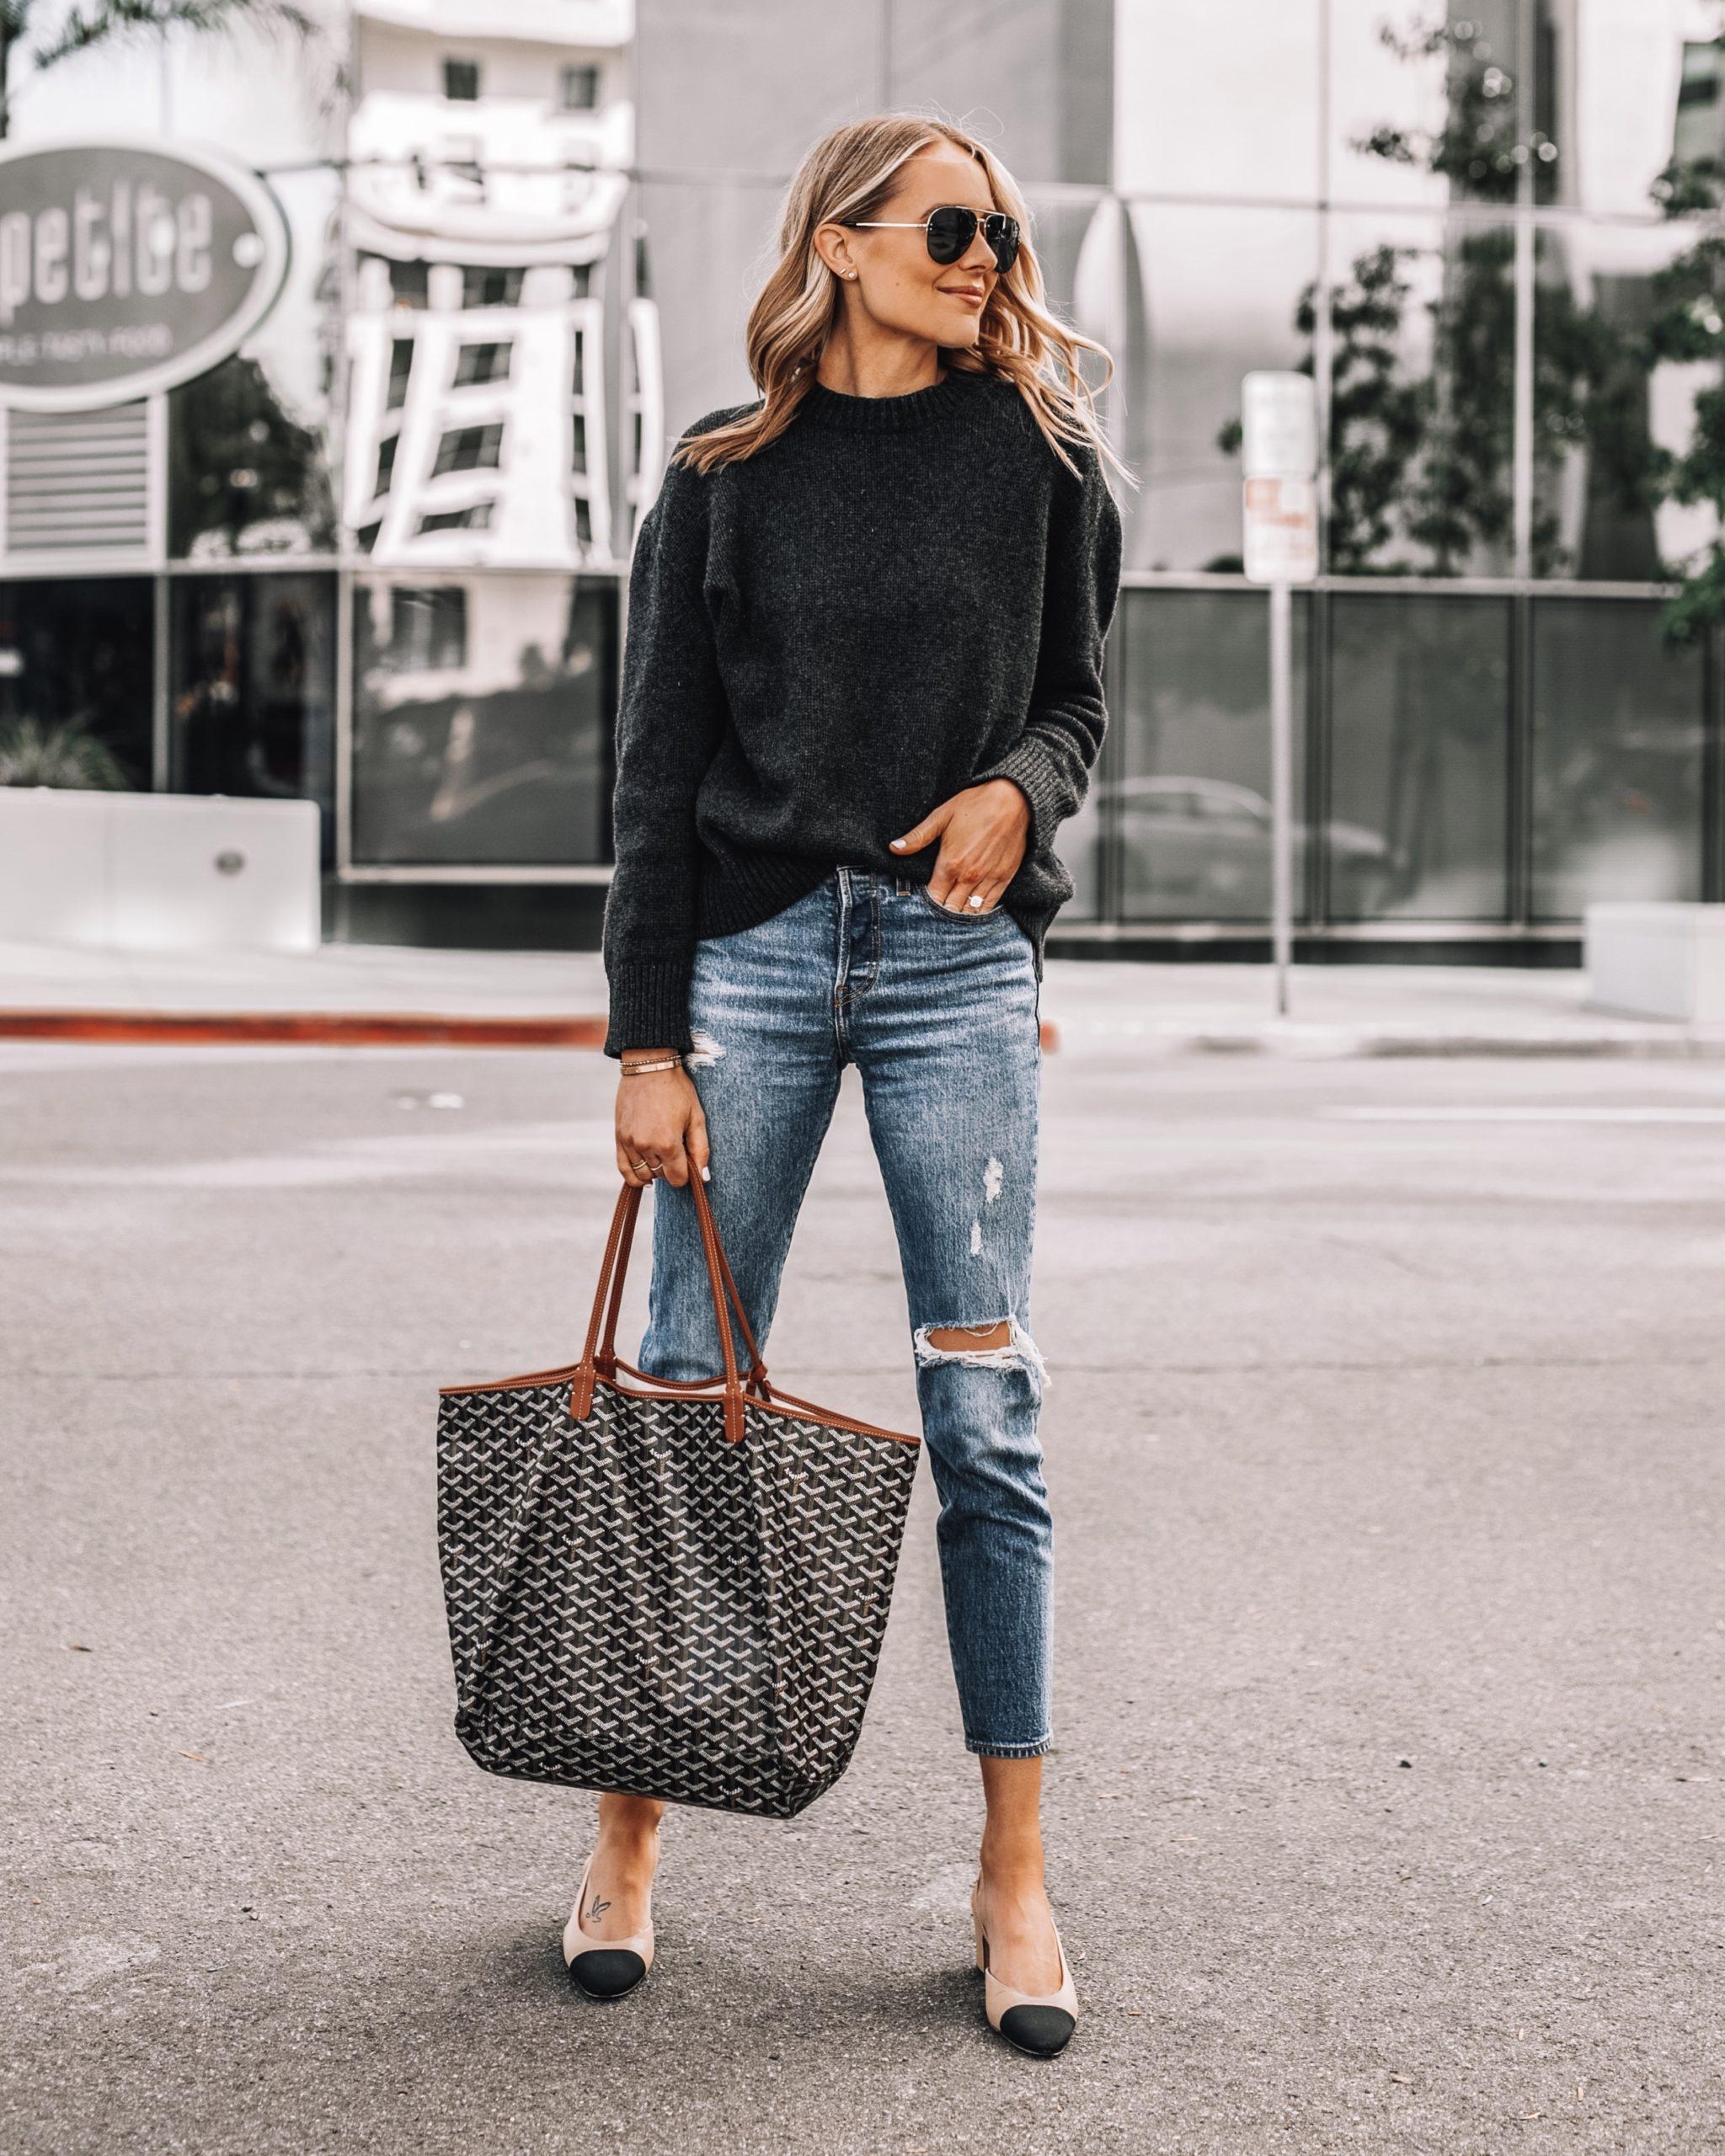 Fashion Jackson Wearing Anine Bing Grey Sweater Levis Ripped Jeans Chanel Slingbacks Goyard Tote